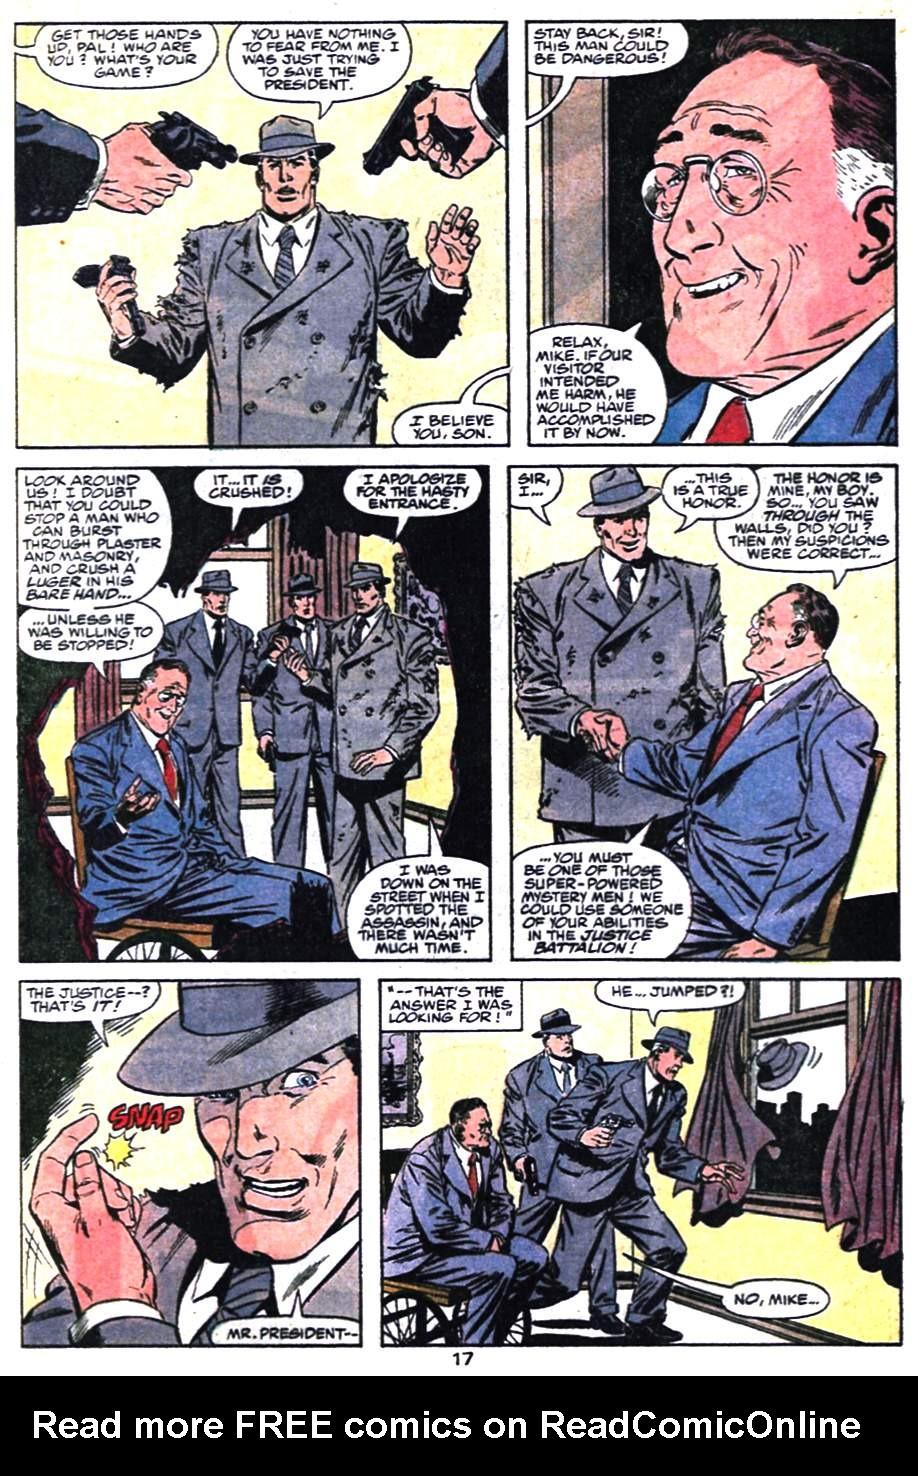 Action Comics (1938) 663 Page 17